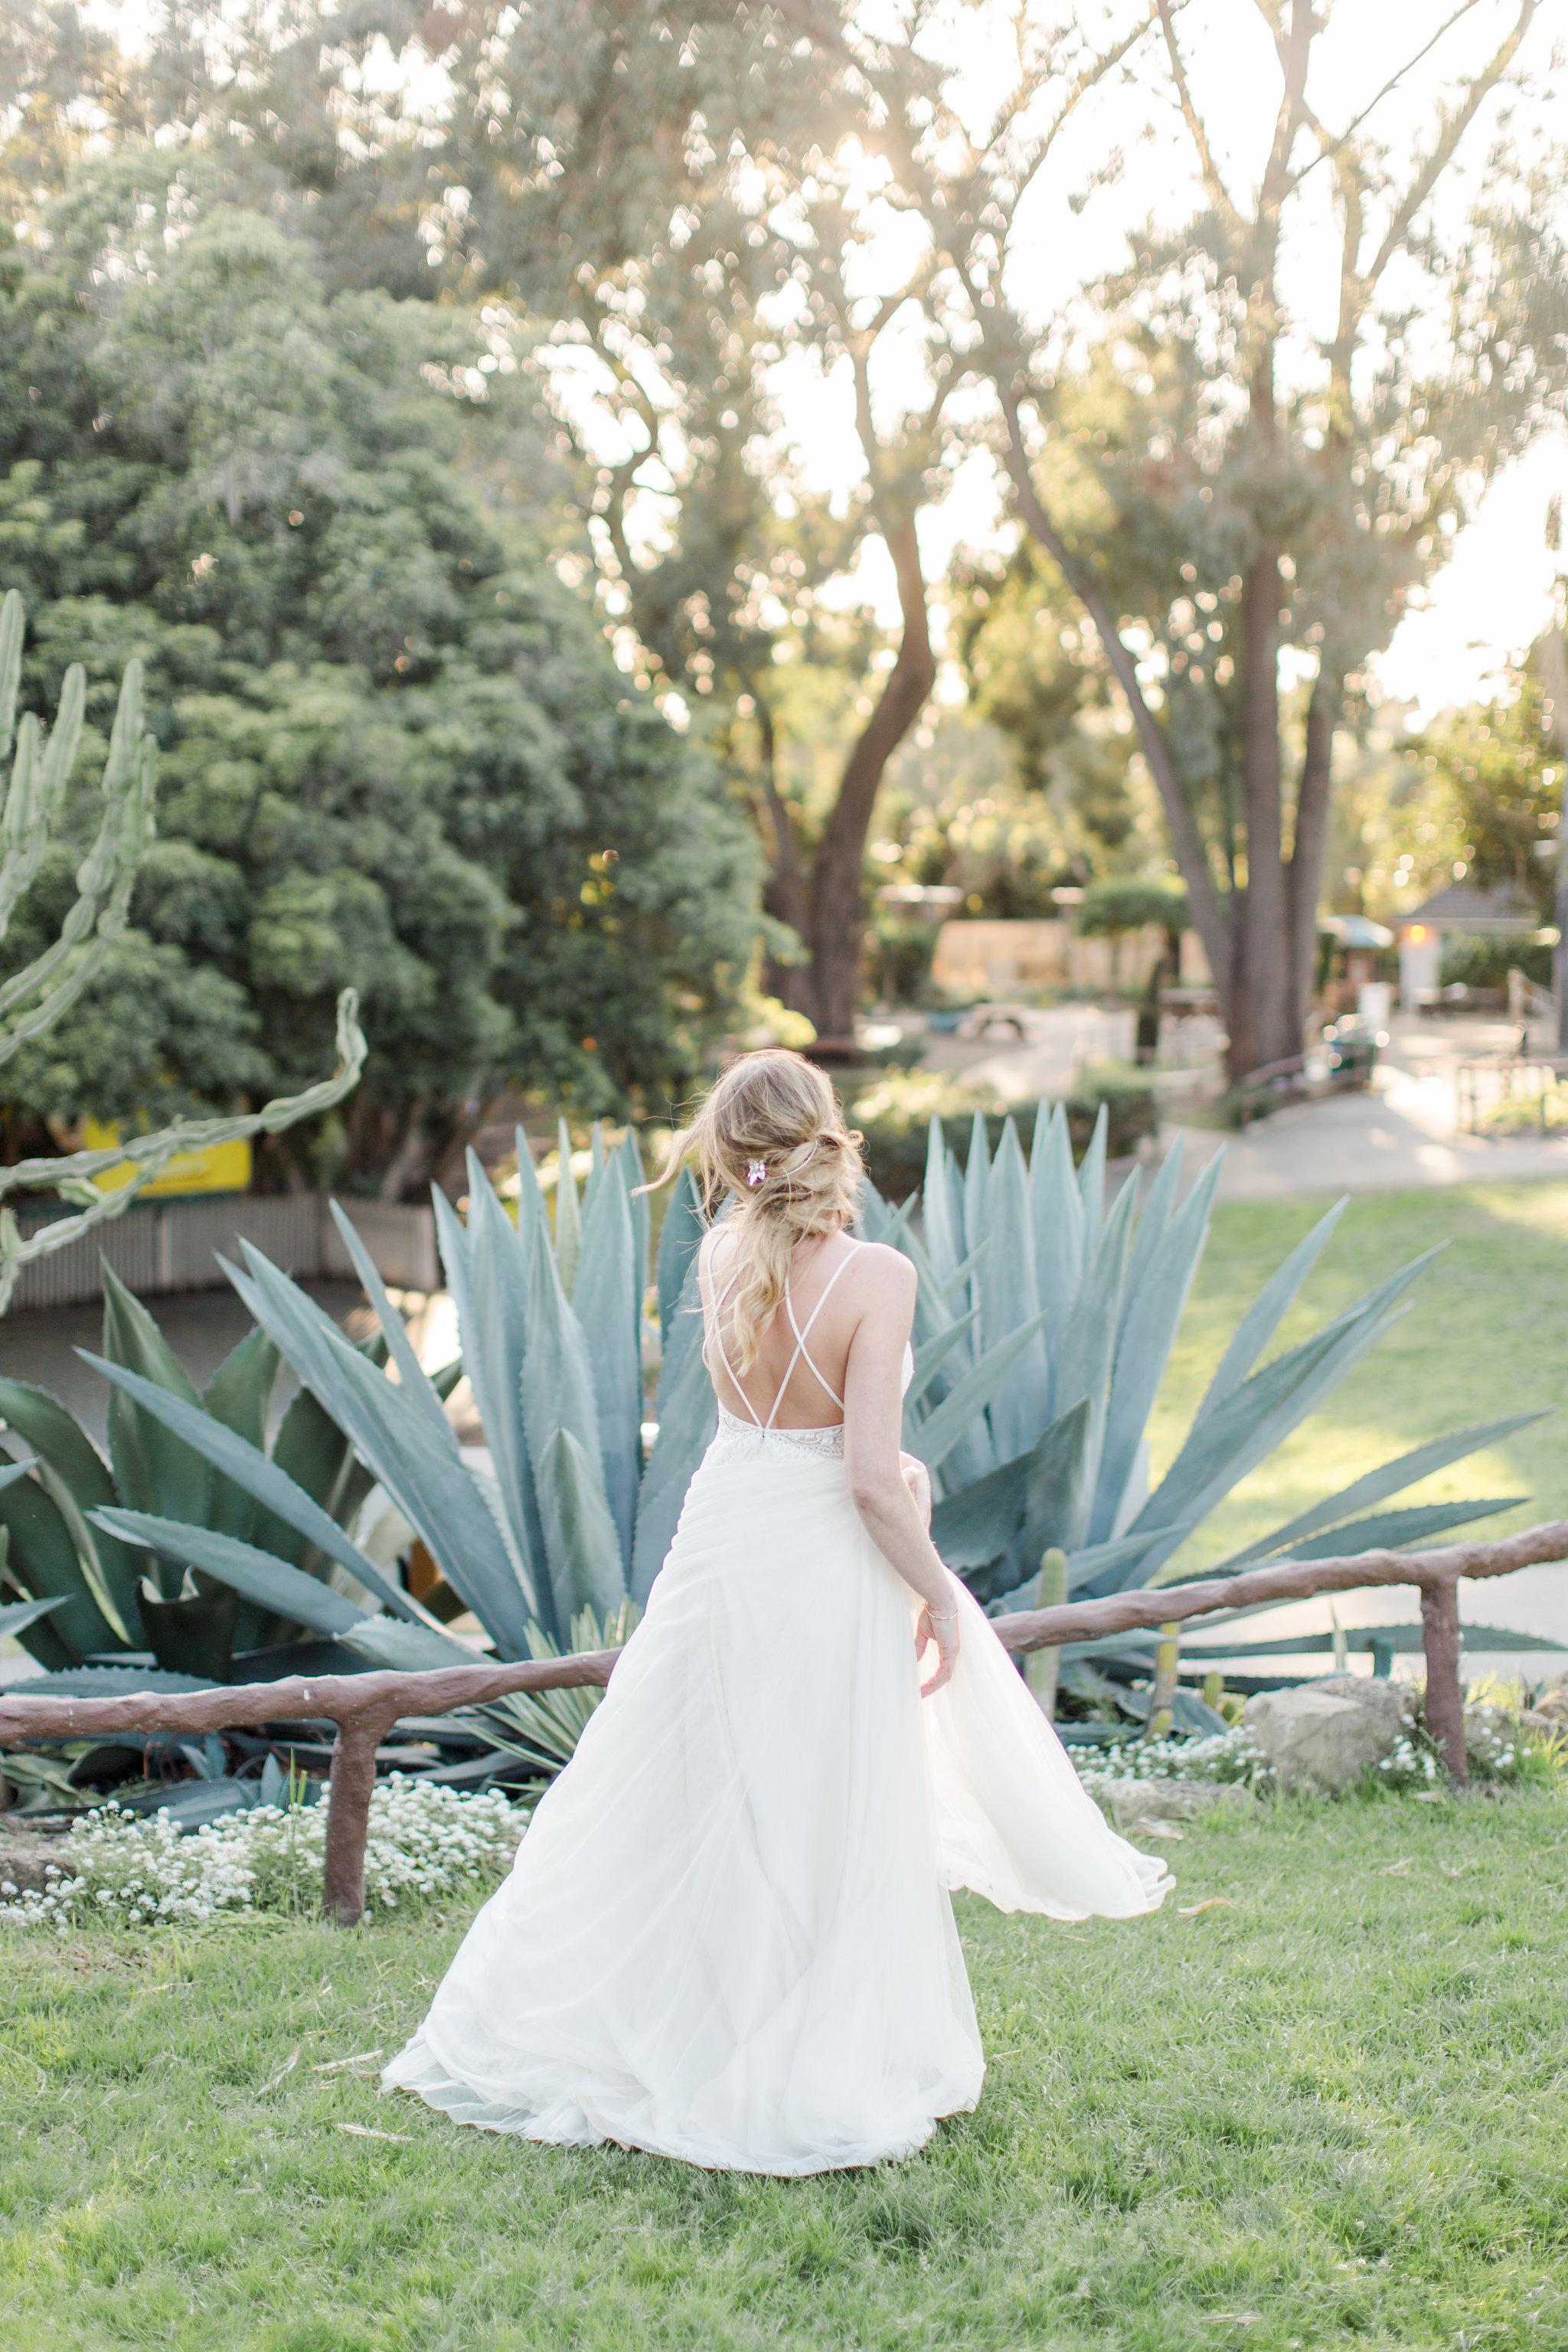 JessieandBryanGilbreath_AngelicaMariePhotography_SantaBarbaraWeddingPhotographer_572.JPG